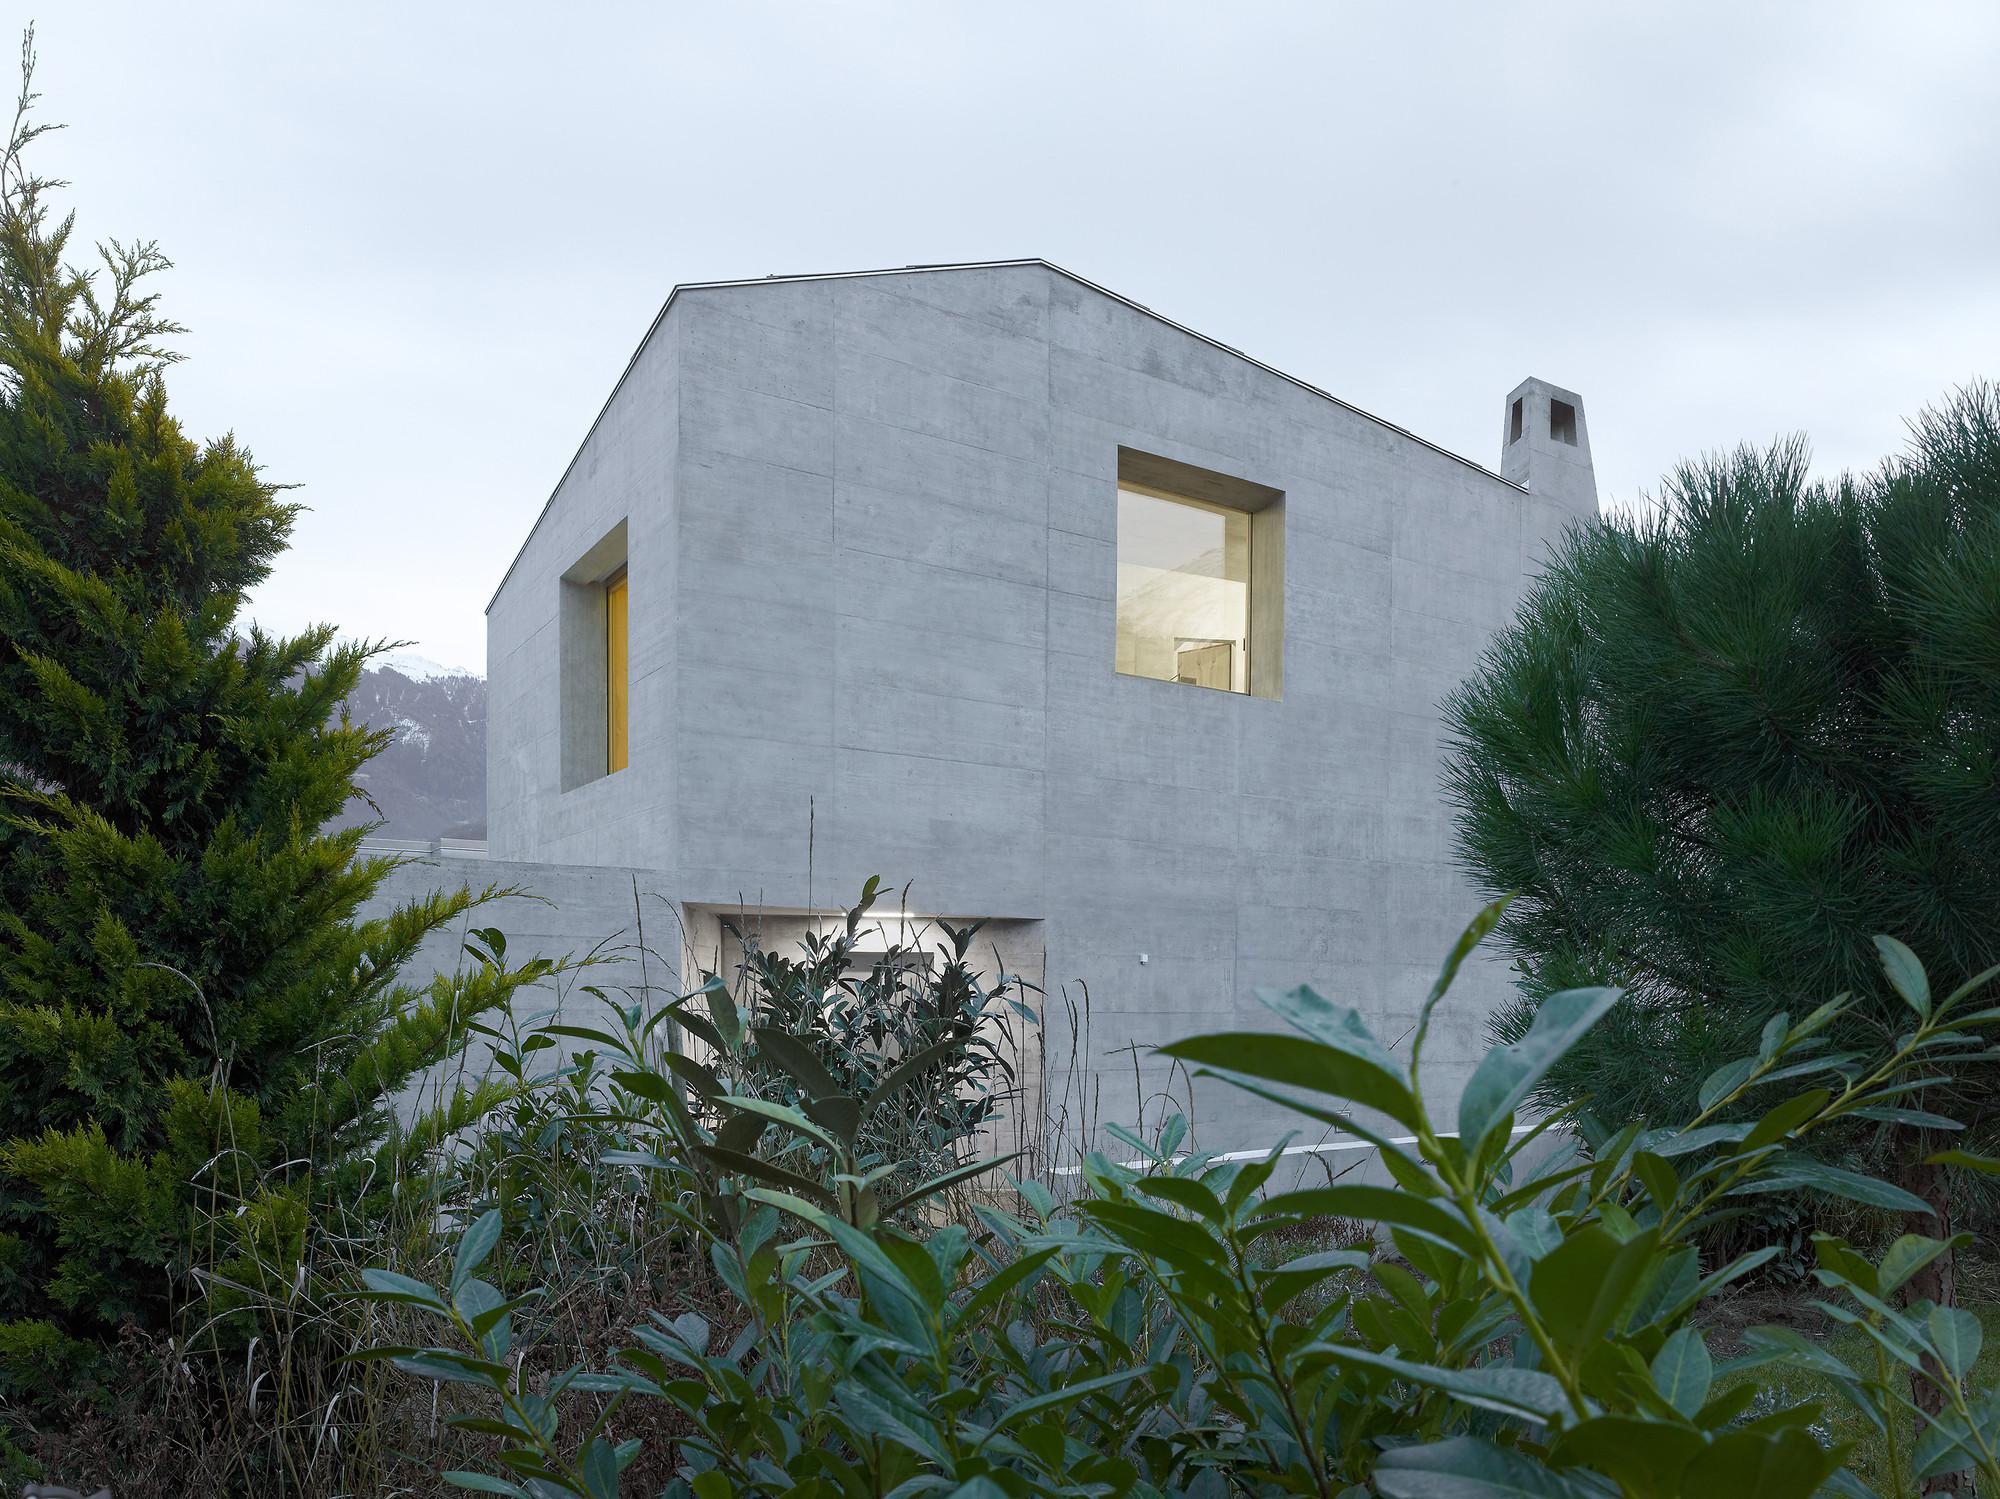 gallery of maison fabrizzi savioz fabrizzi architectes 3. Black Bedroom Furniture Sets. Home Design Ideas